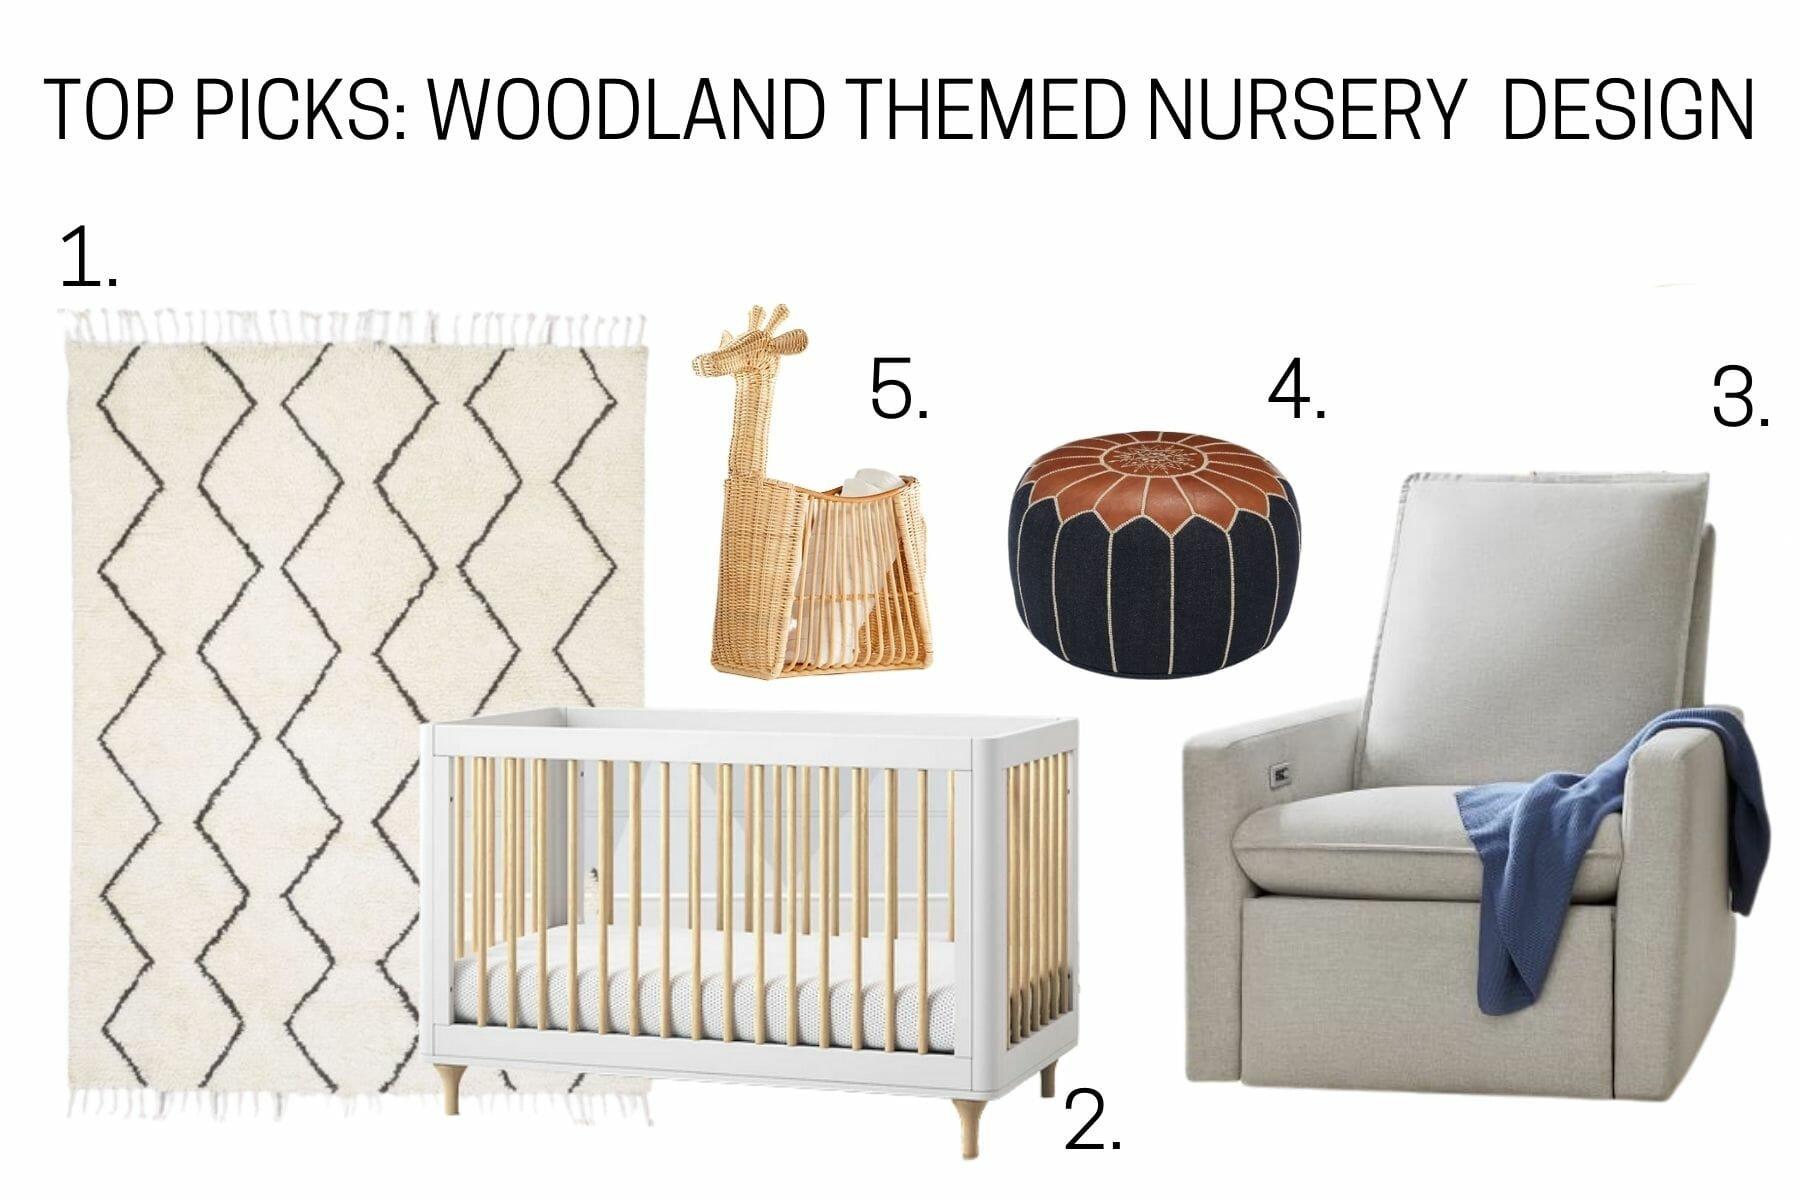 Woodland themed nursery top picks